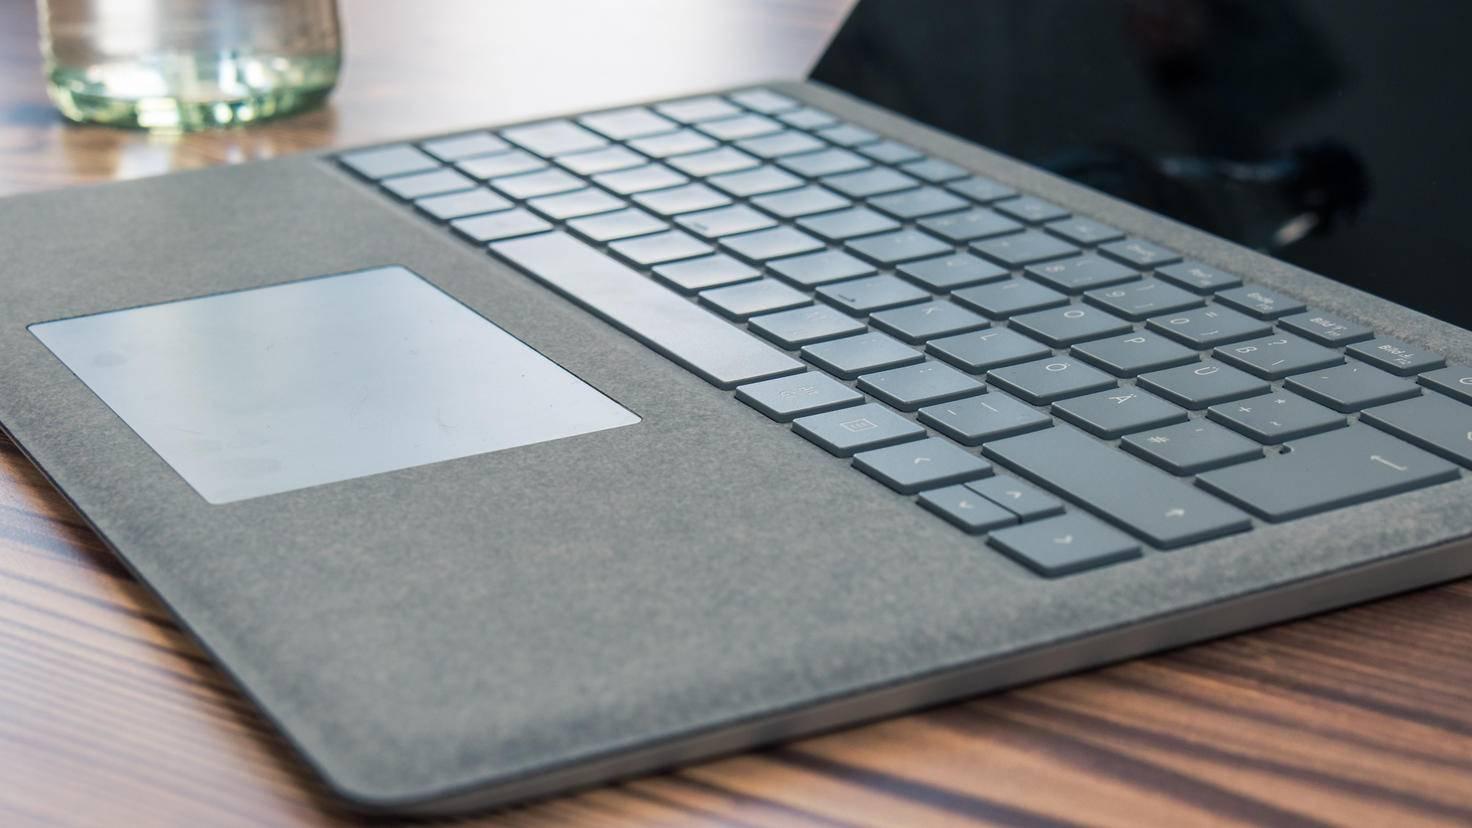 Microsoft-Surface-Laptop-02